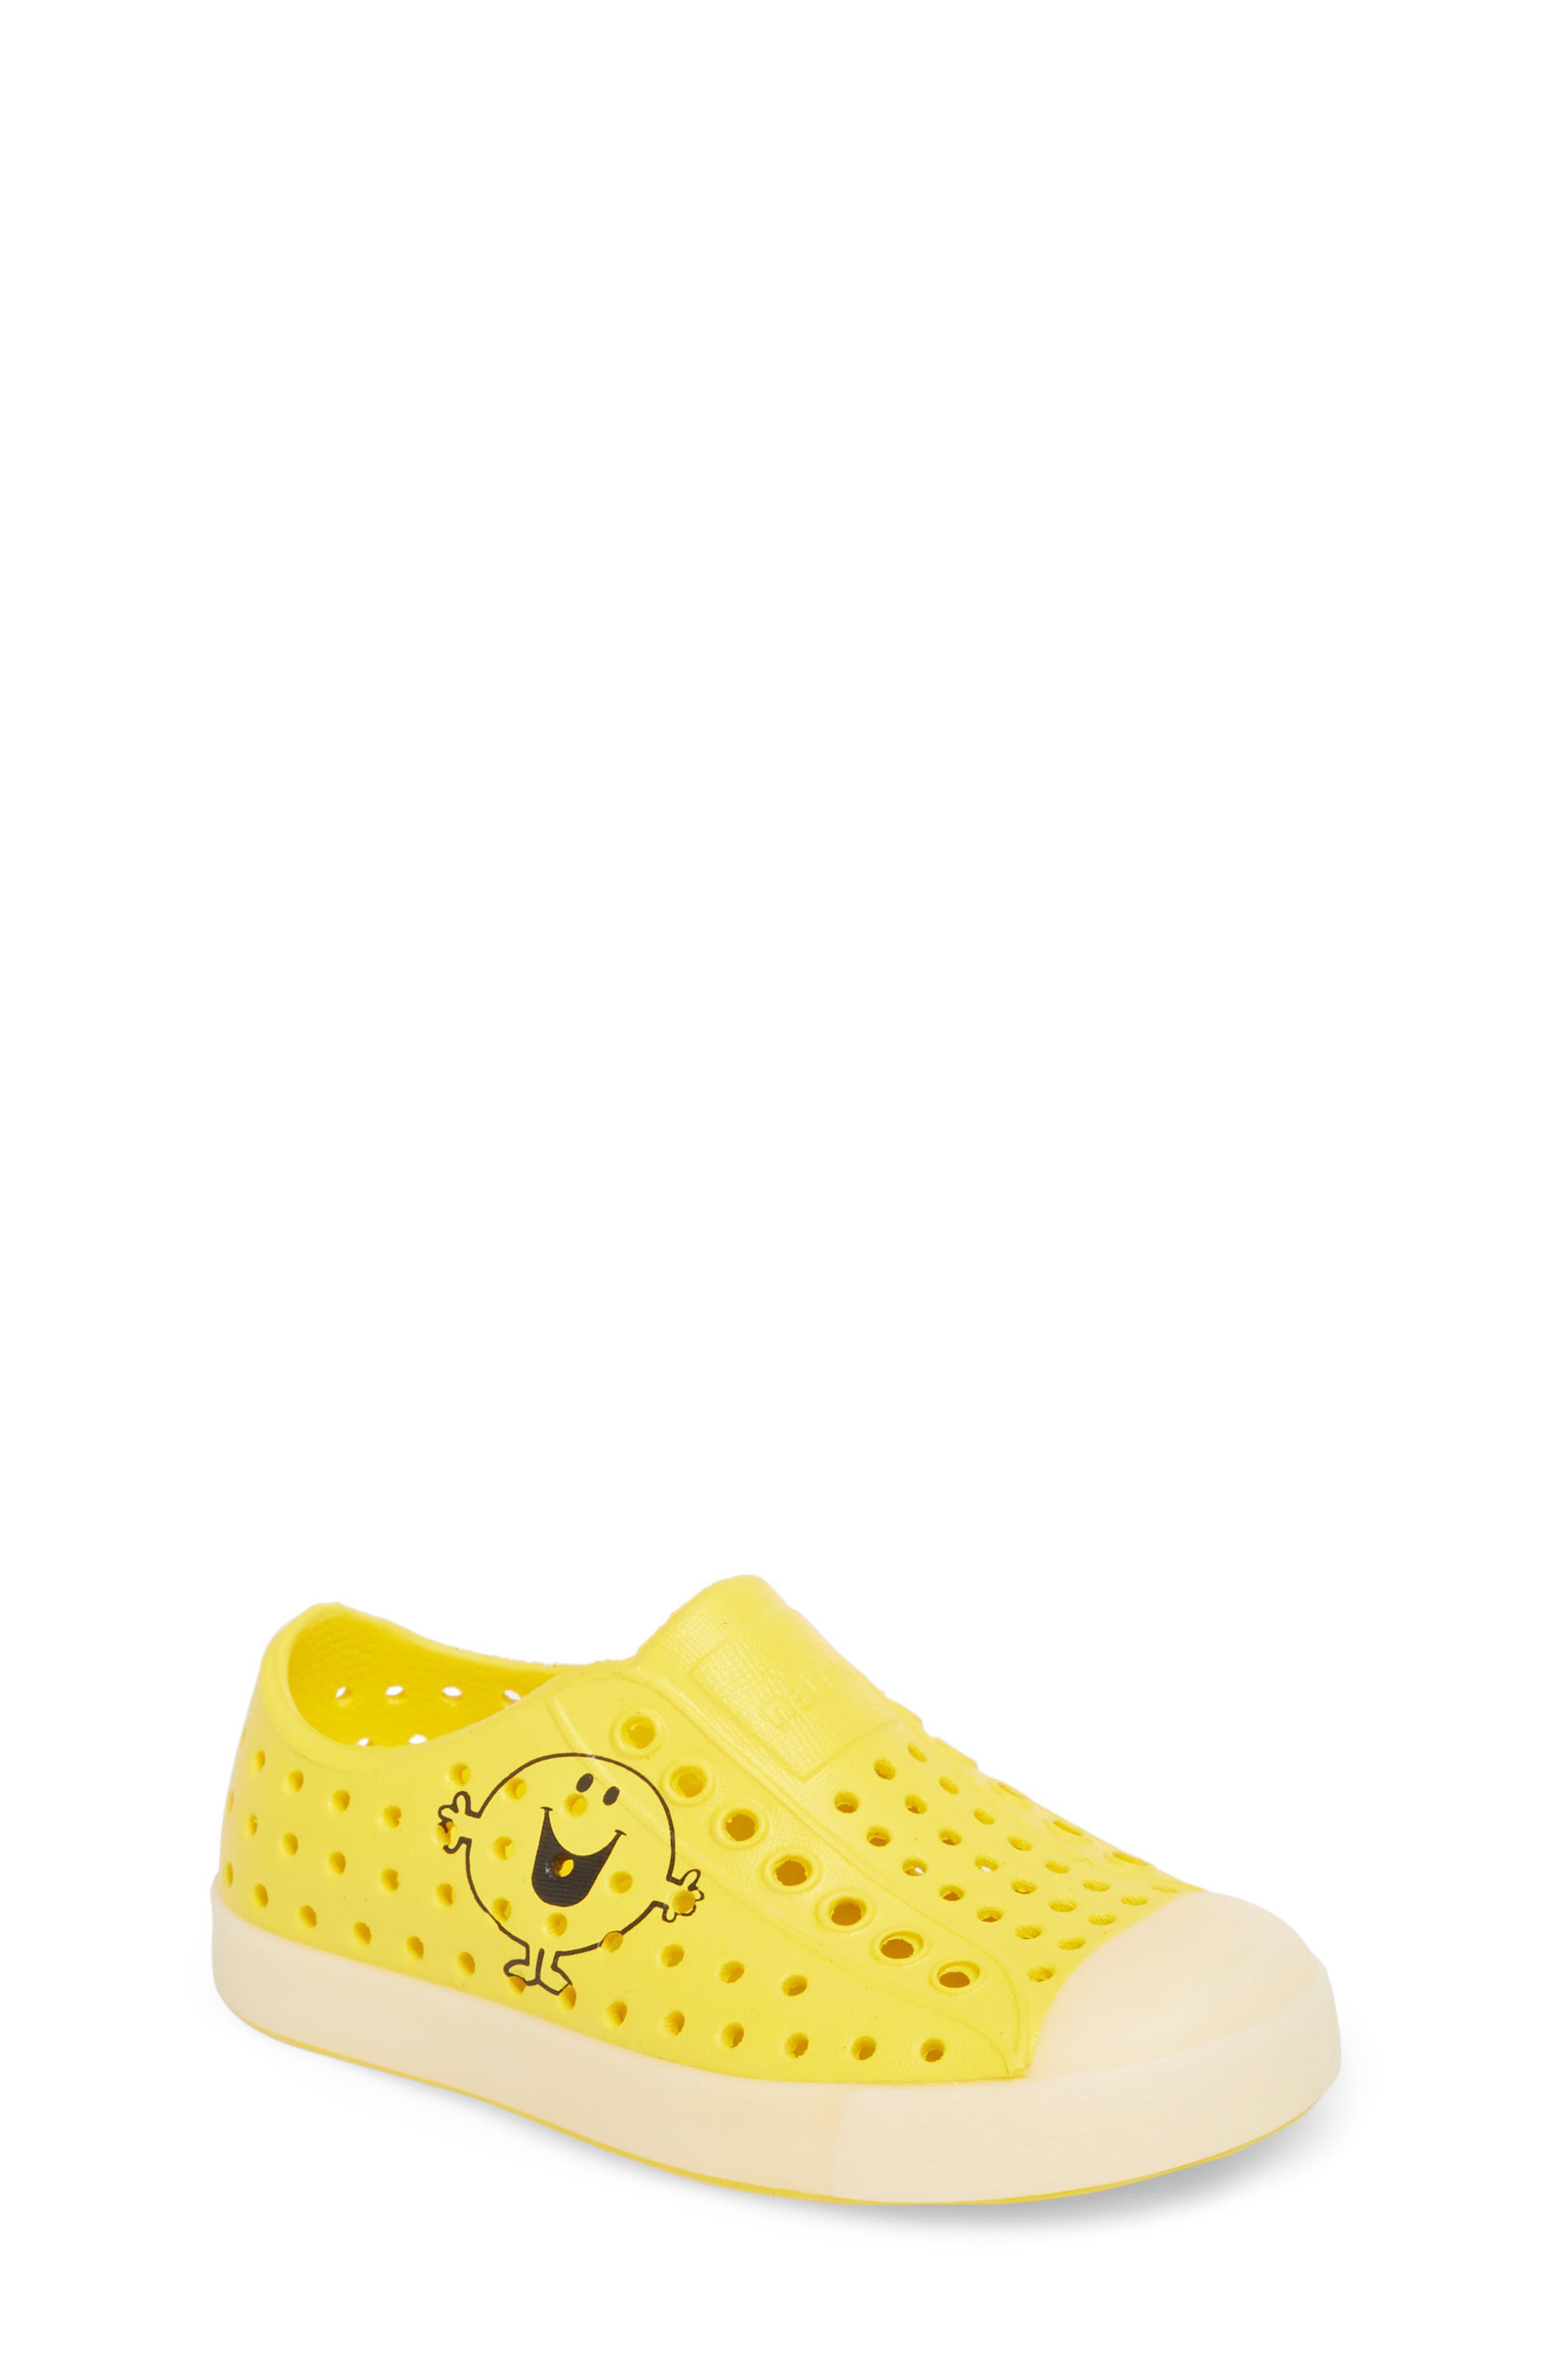 Jefferson - Glow in the Dark Sneaker,                             Main thumbnail 1, color,                             Mr. Happy Yellow/ Glow